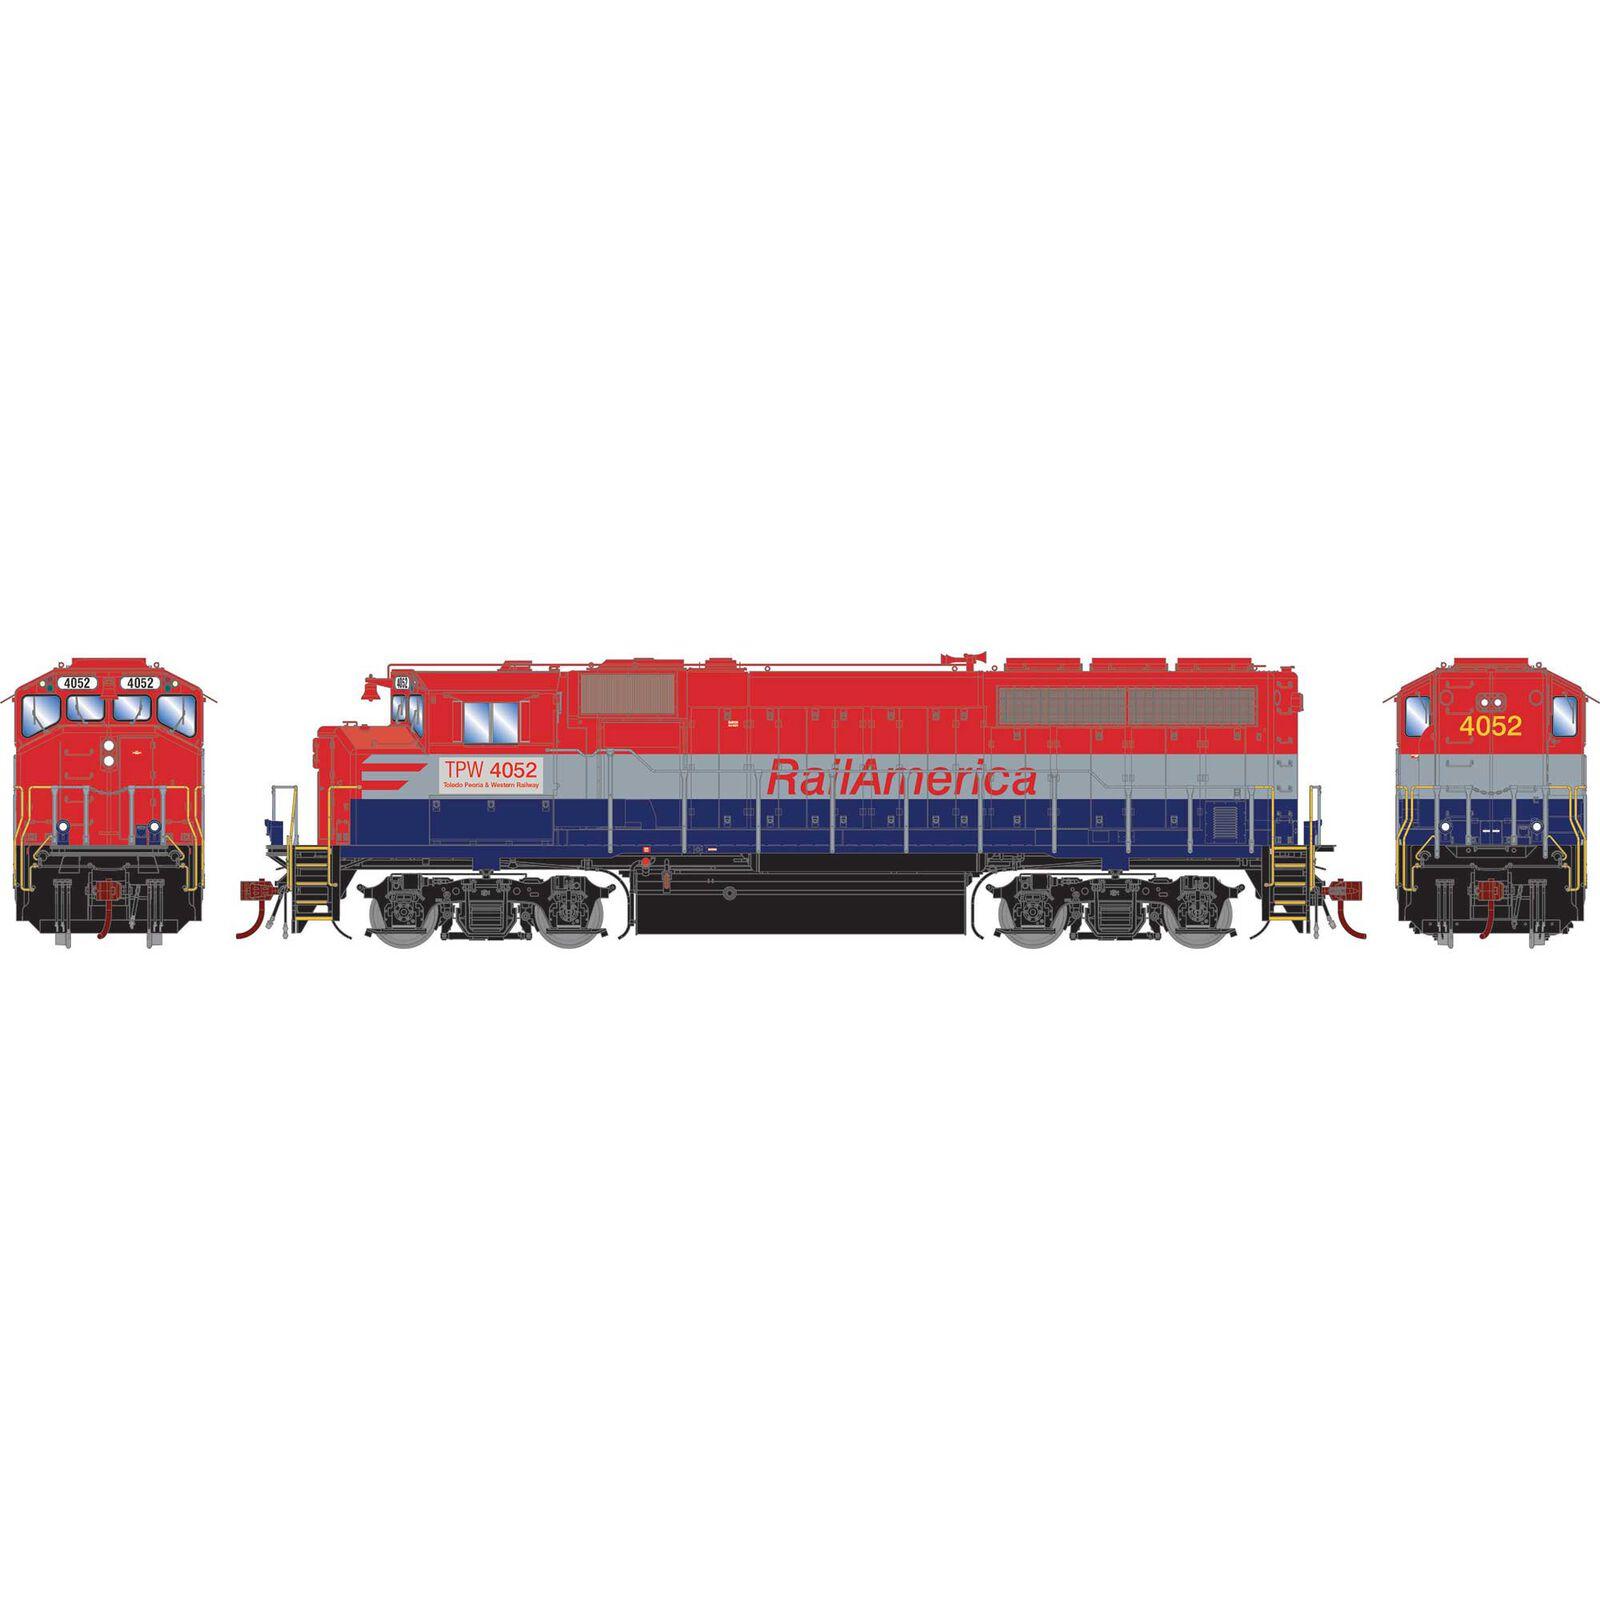 HO GP40-2L with DCC & Sound, Rail America/TP&W #4052